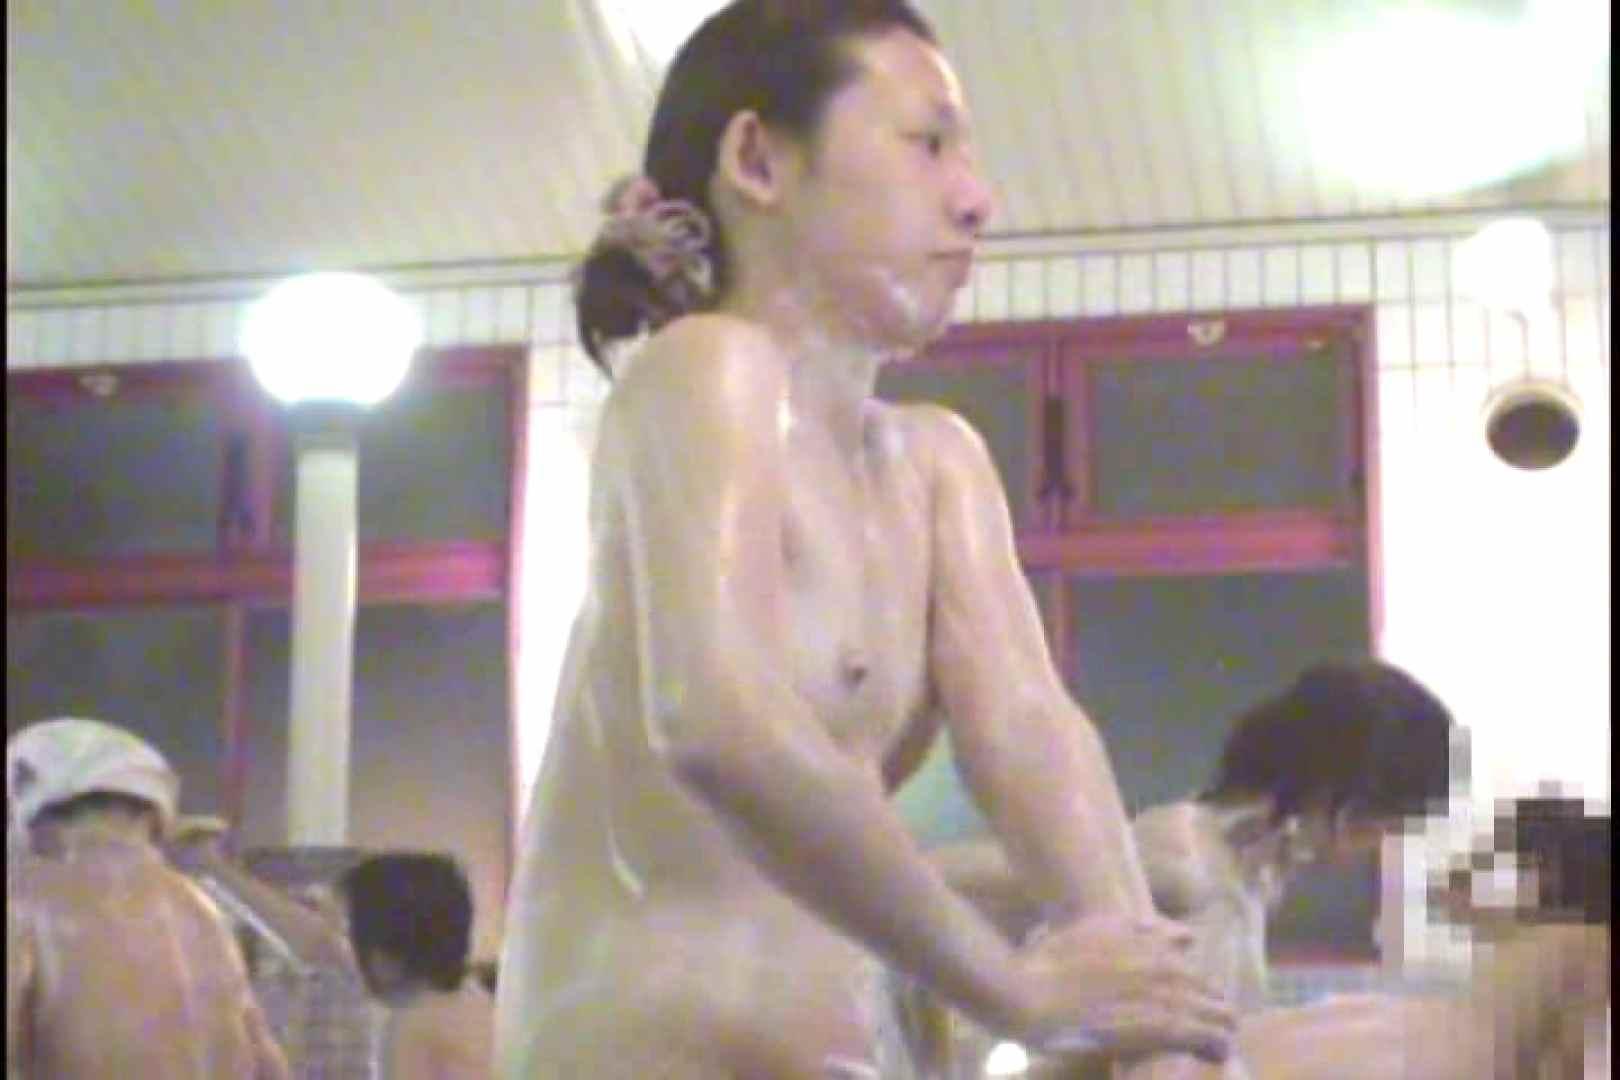 果実の泉 vol.1 美女 オメコ無修正動画無料 100連発 23